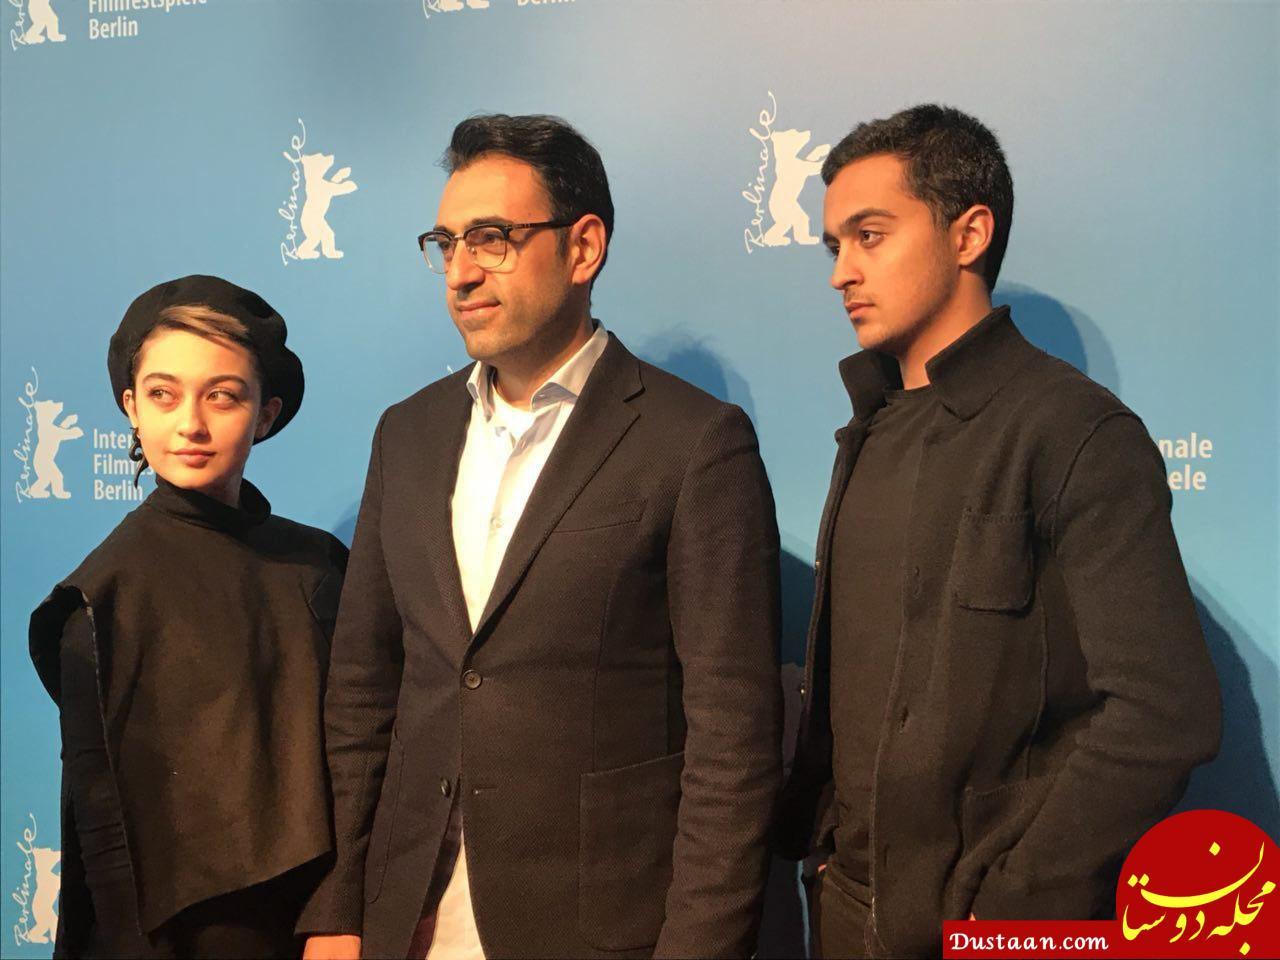 www.dustaan.com استقبال از «درساژ» در جشنواره برلین +تصاویر